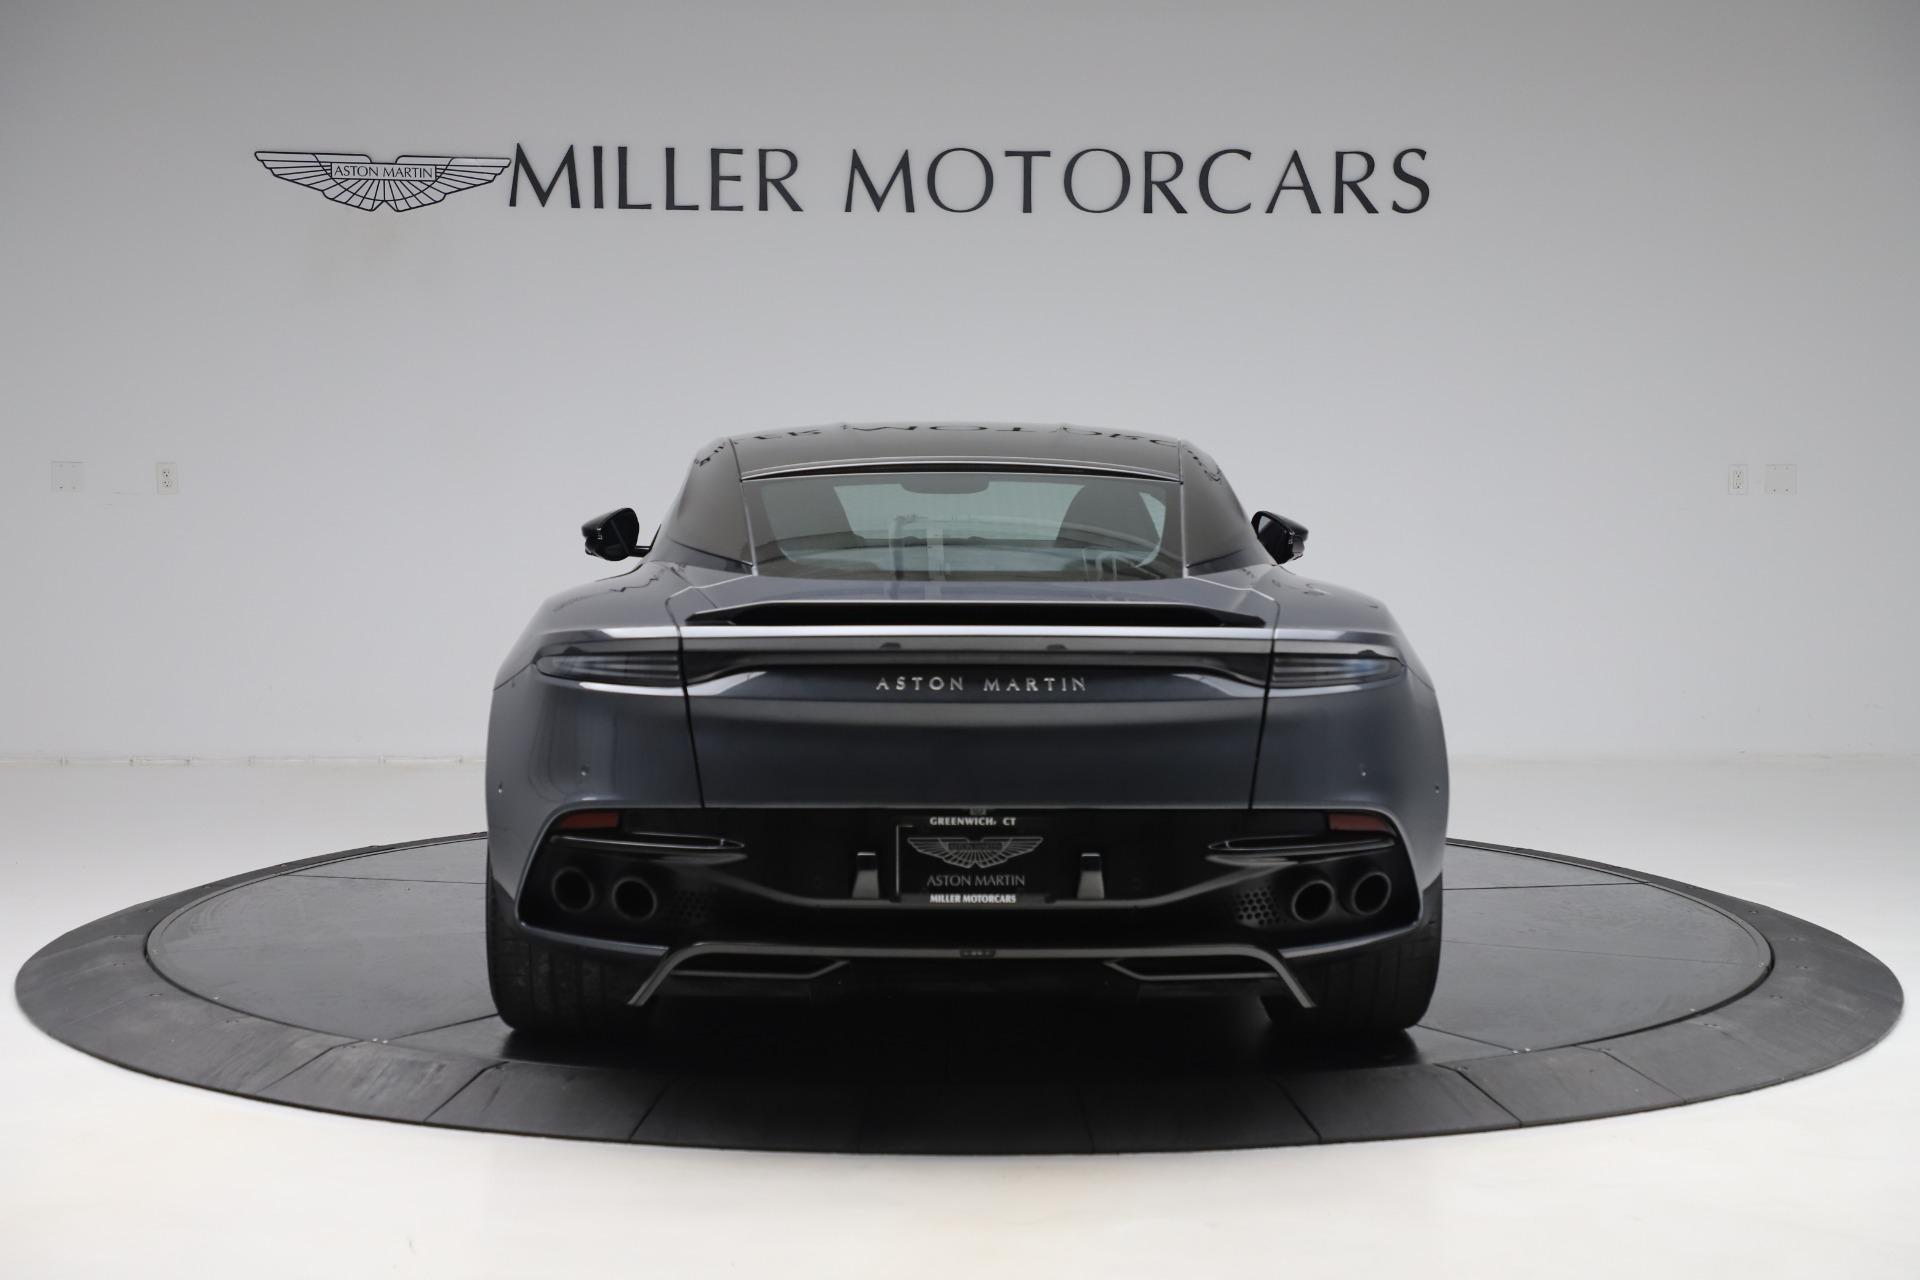 Used 2019 Aston Martin DBS Superleggera Coupe For Sale In Westport, CT 3570_p6